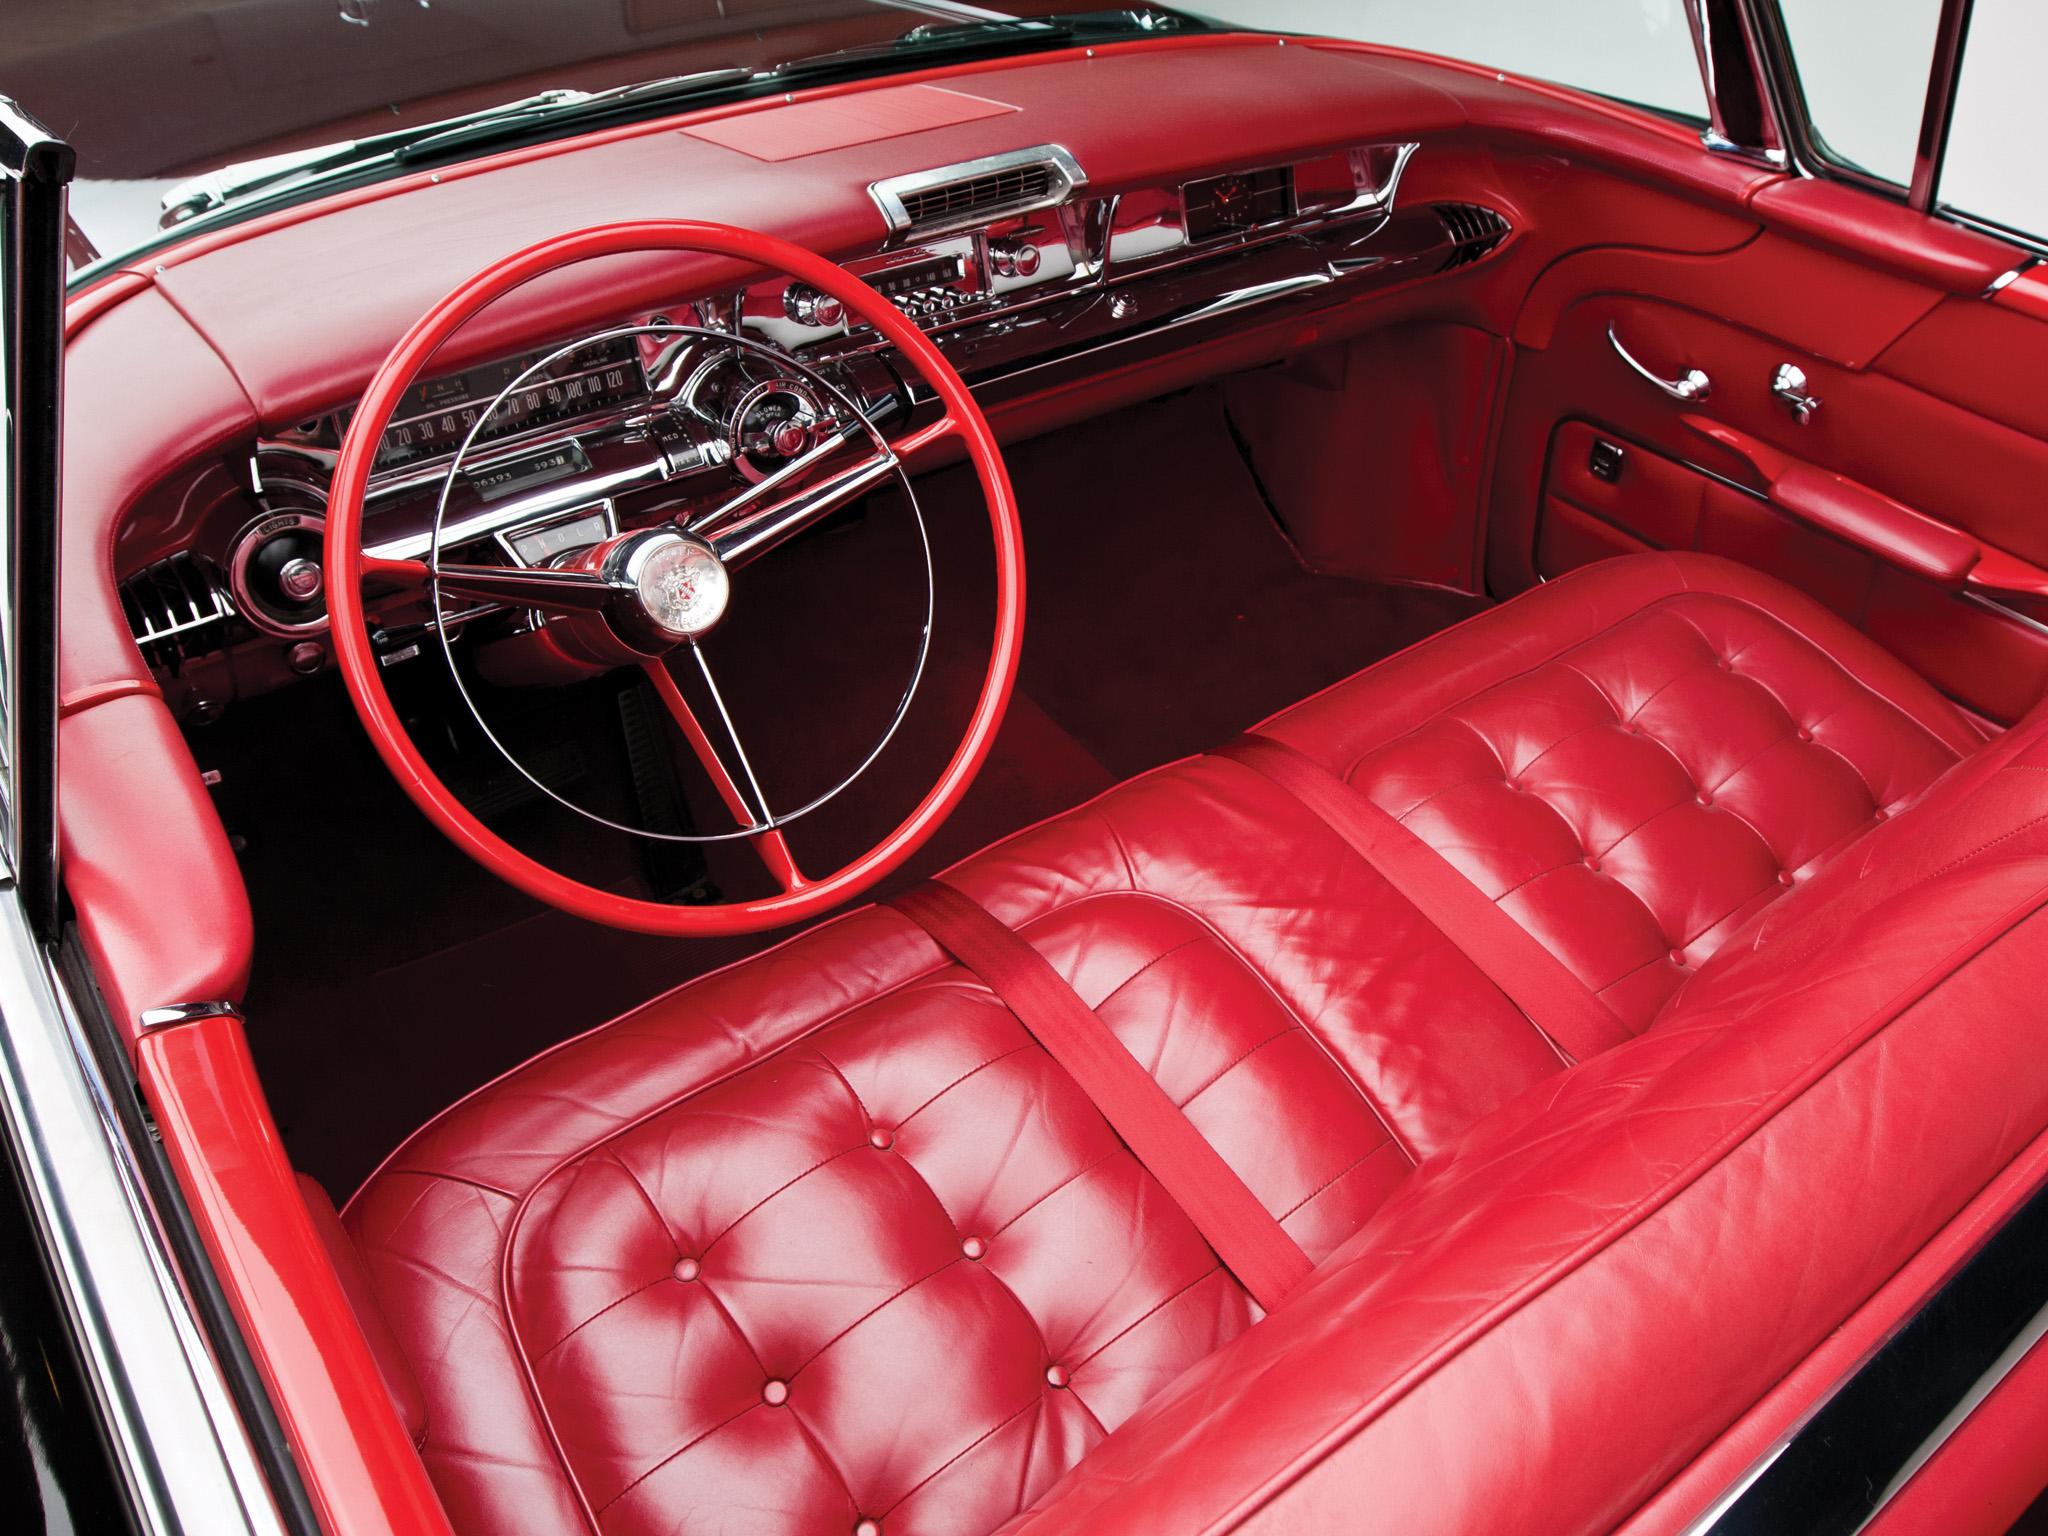 1957 Buick Roadmaster Convertible 76c Retro Interior G